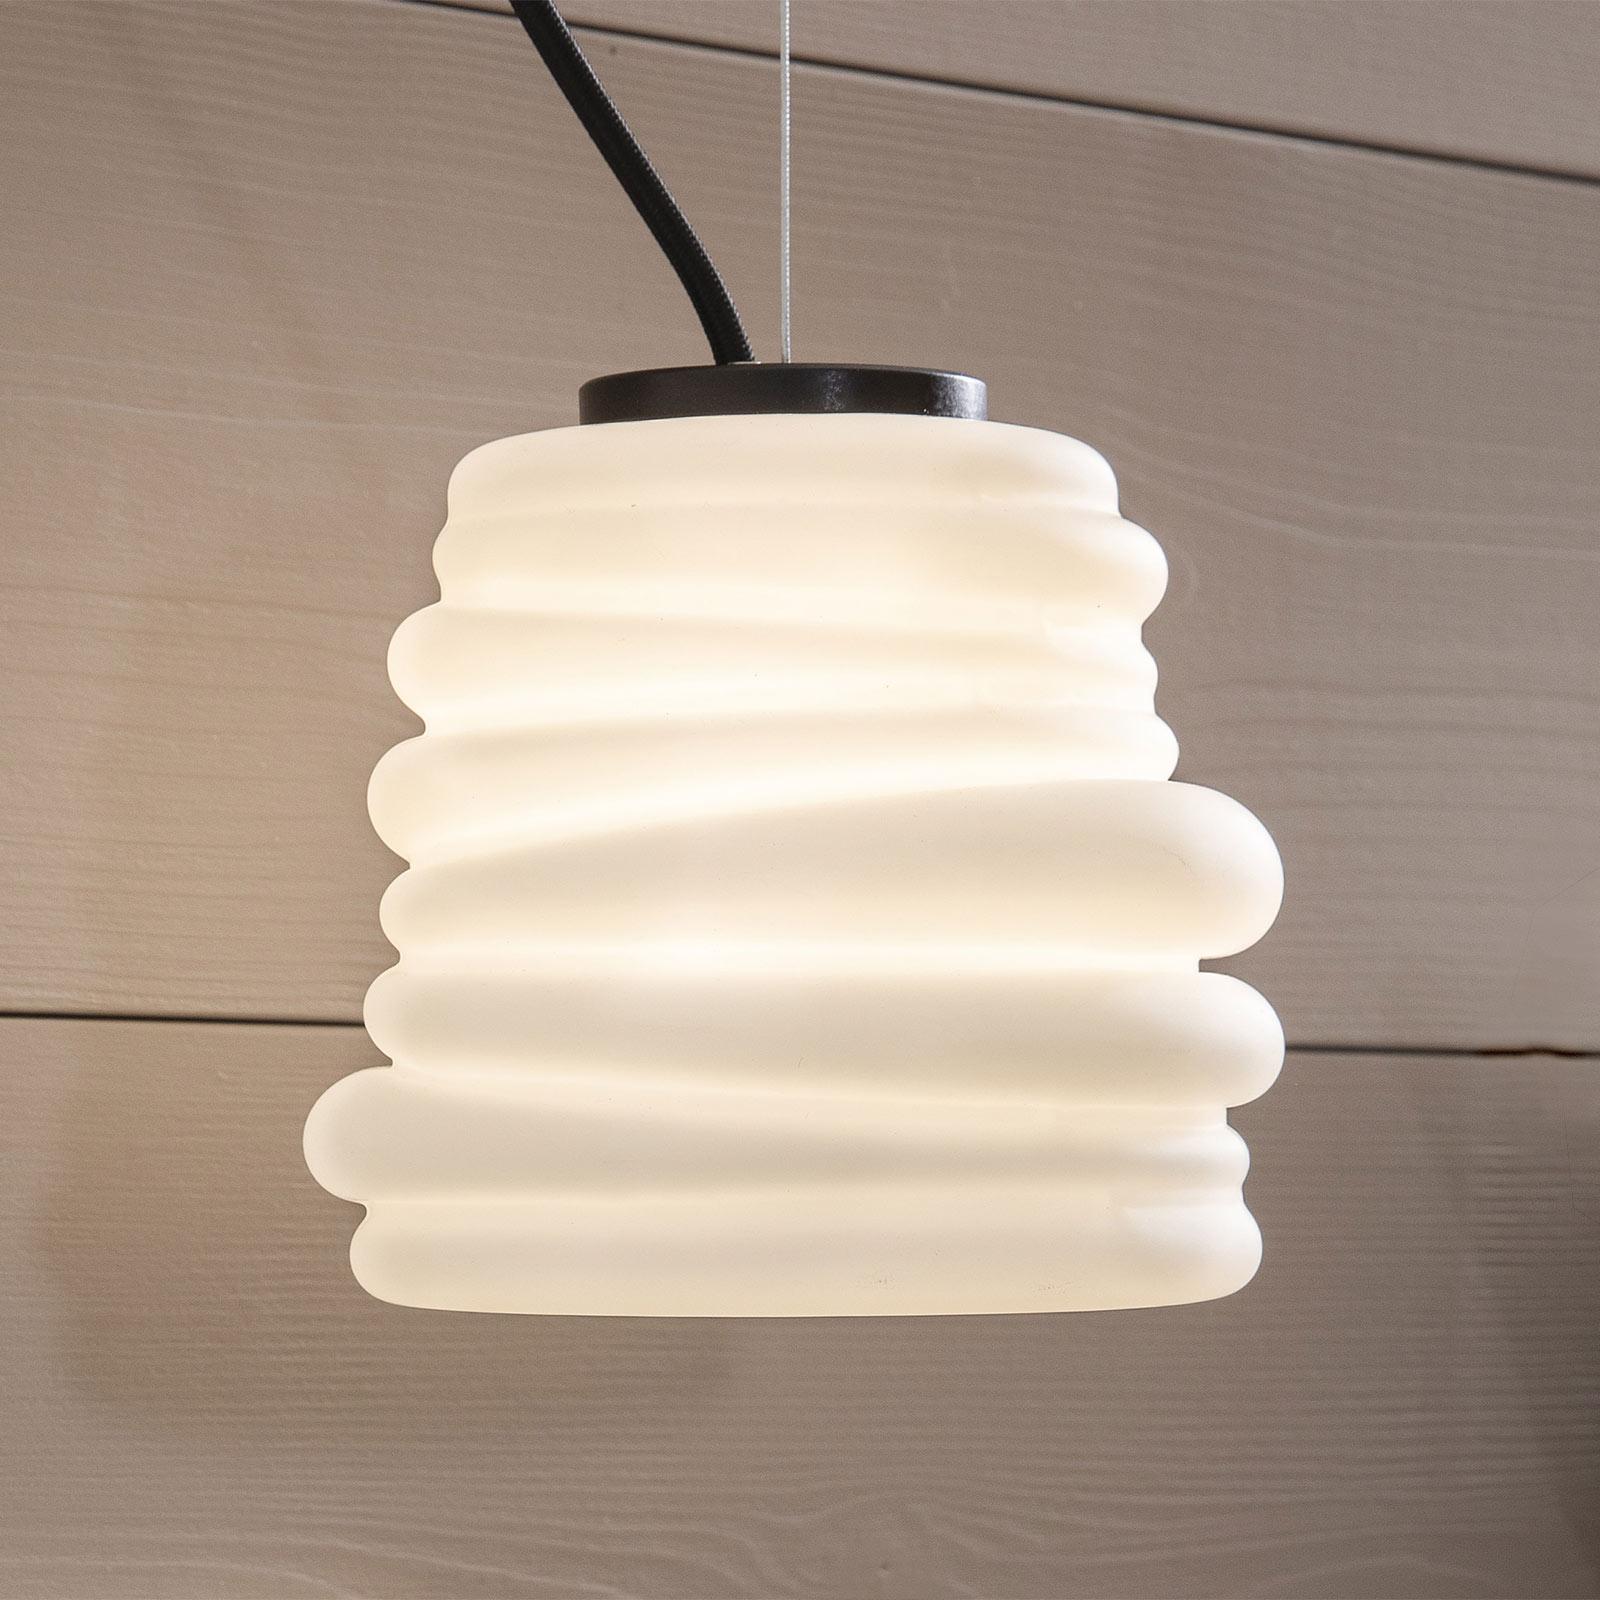 Karman Bibendum suspension LED, Ø 15cm, blanche